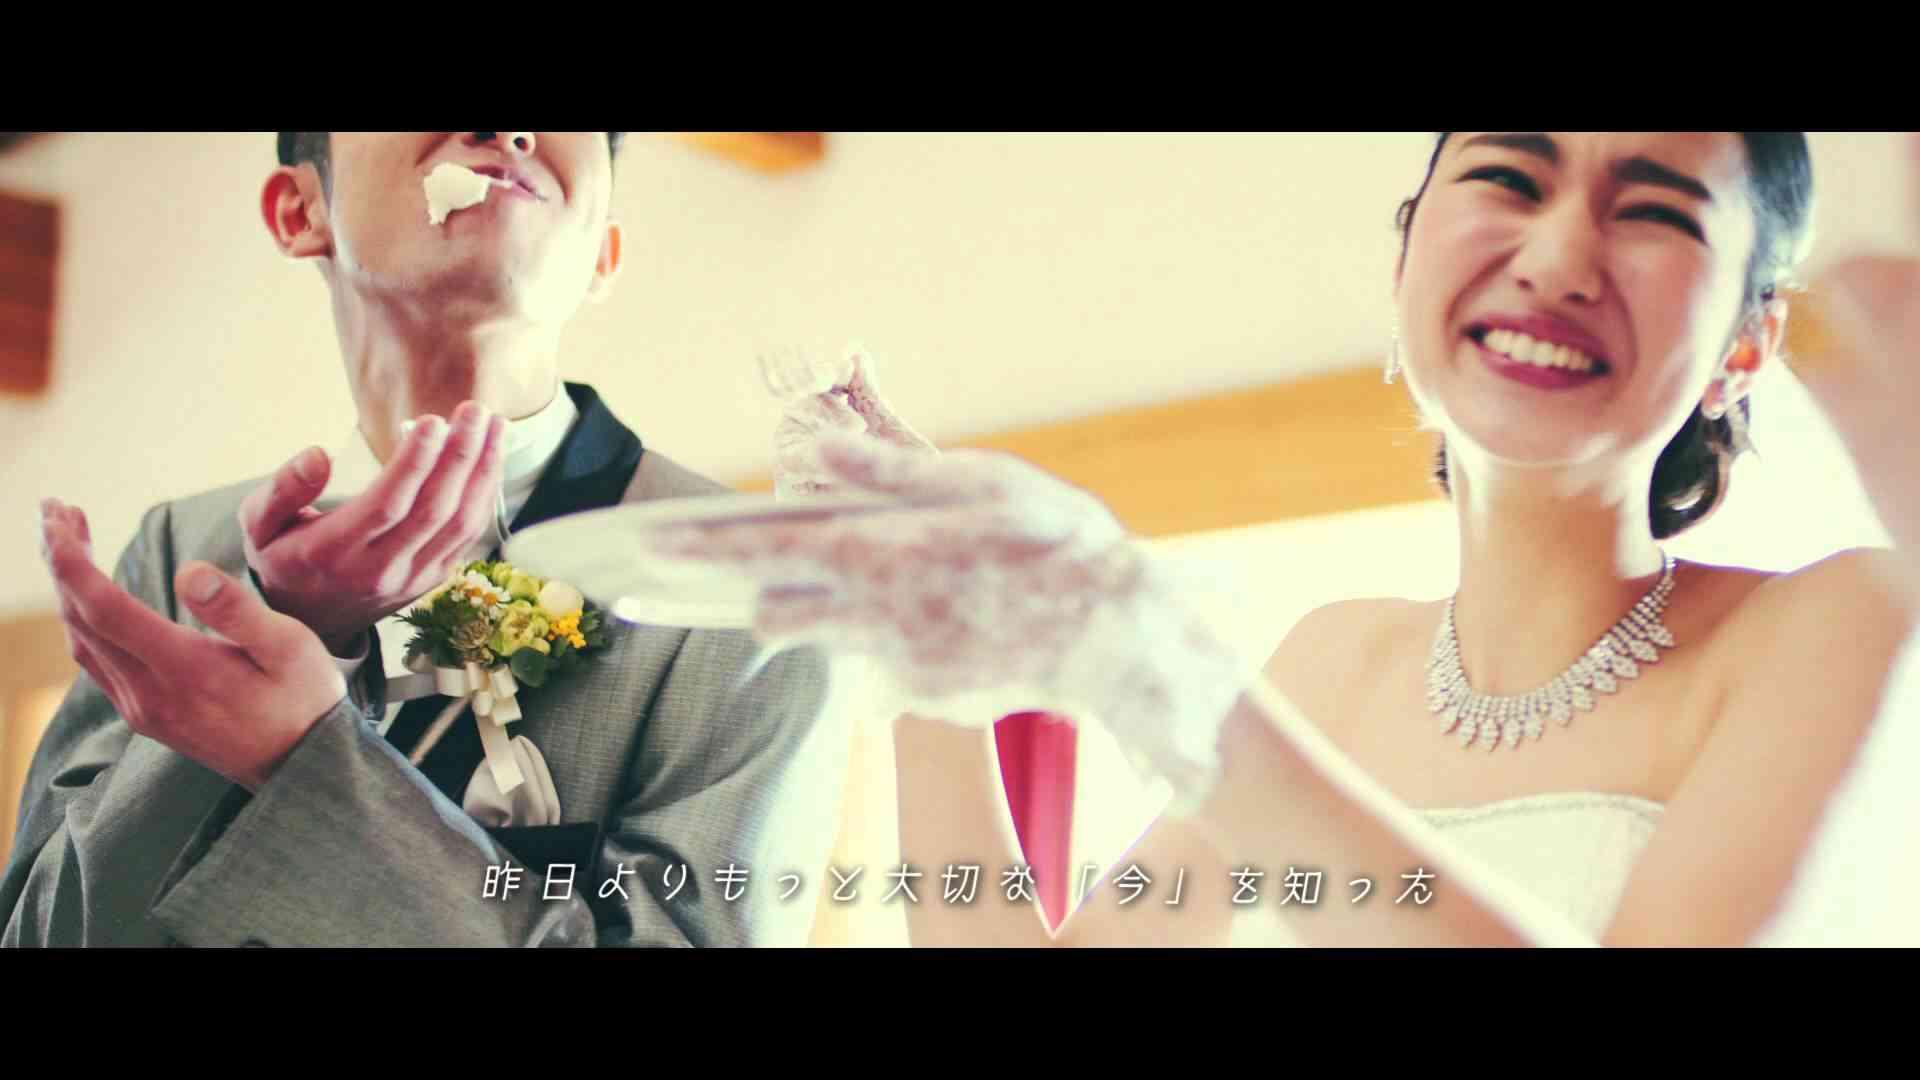 超特急「Yell」MUSIC VIDEO - YouTube